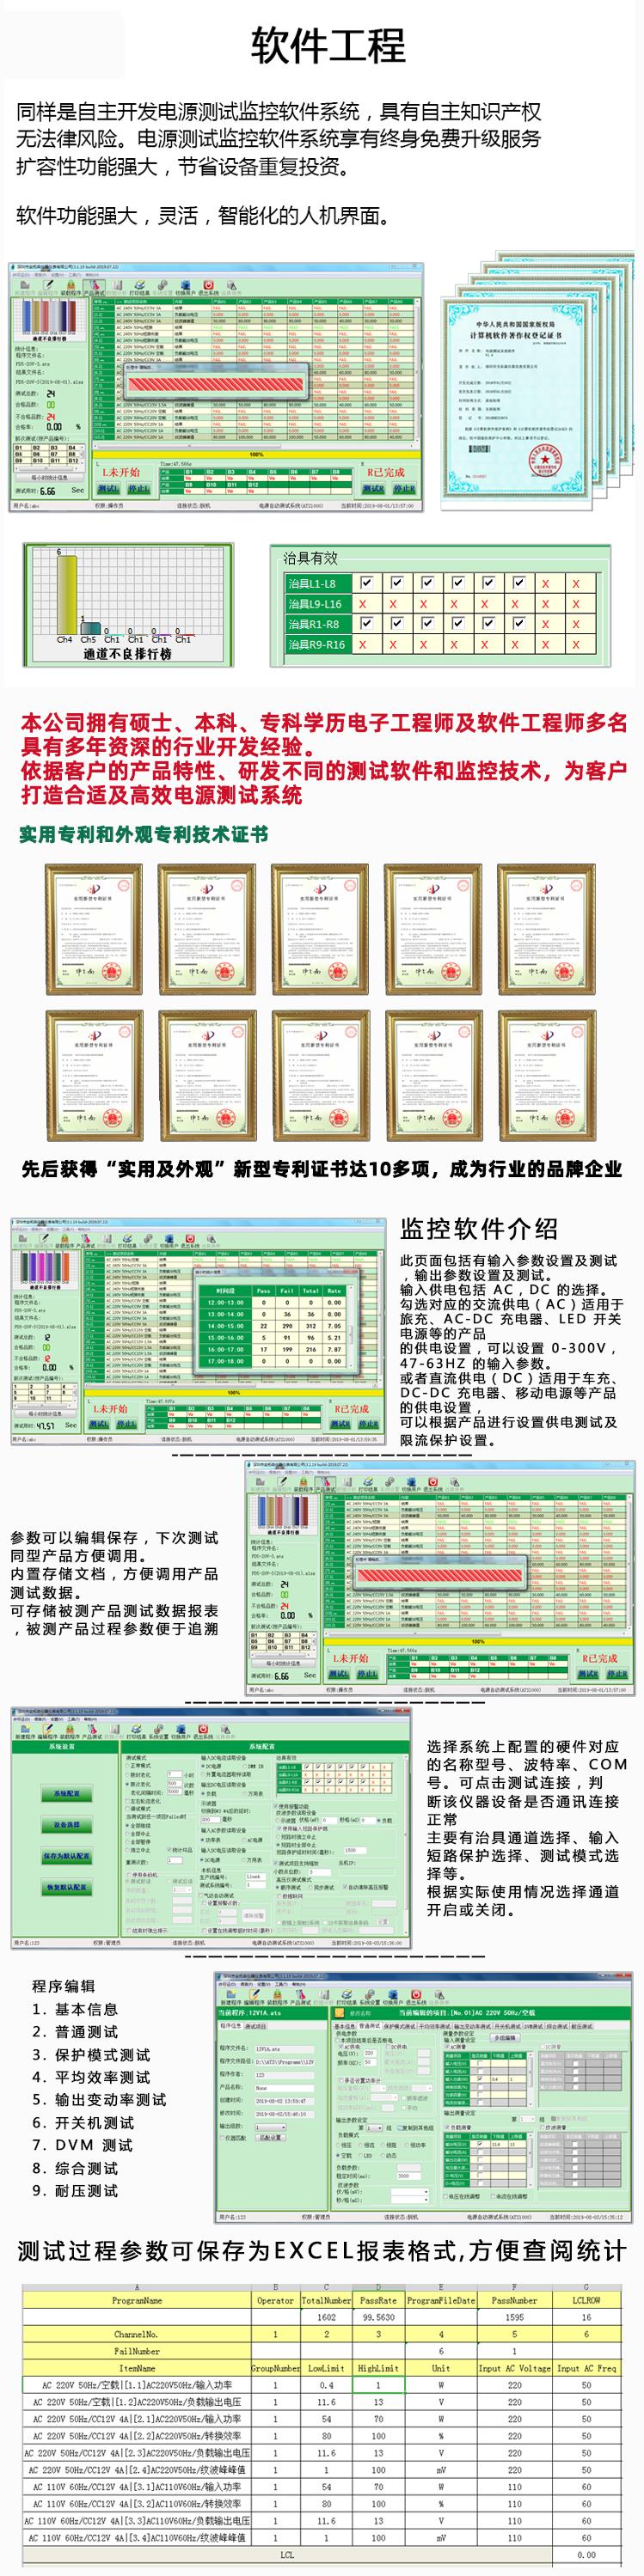 PC电源测试系统